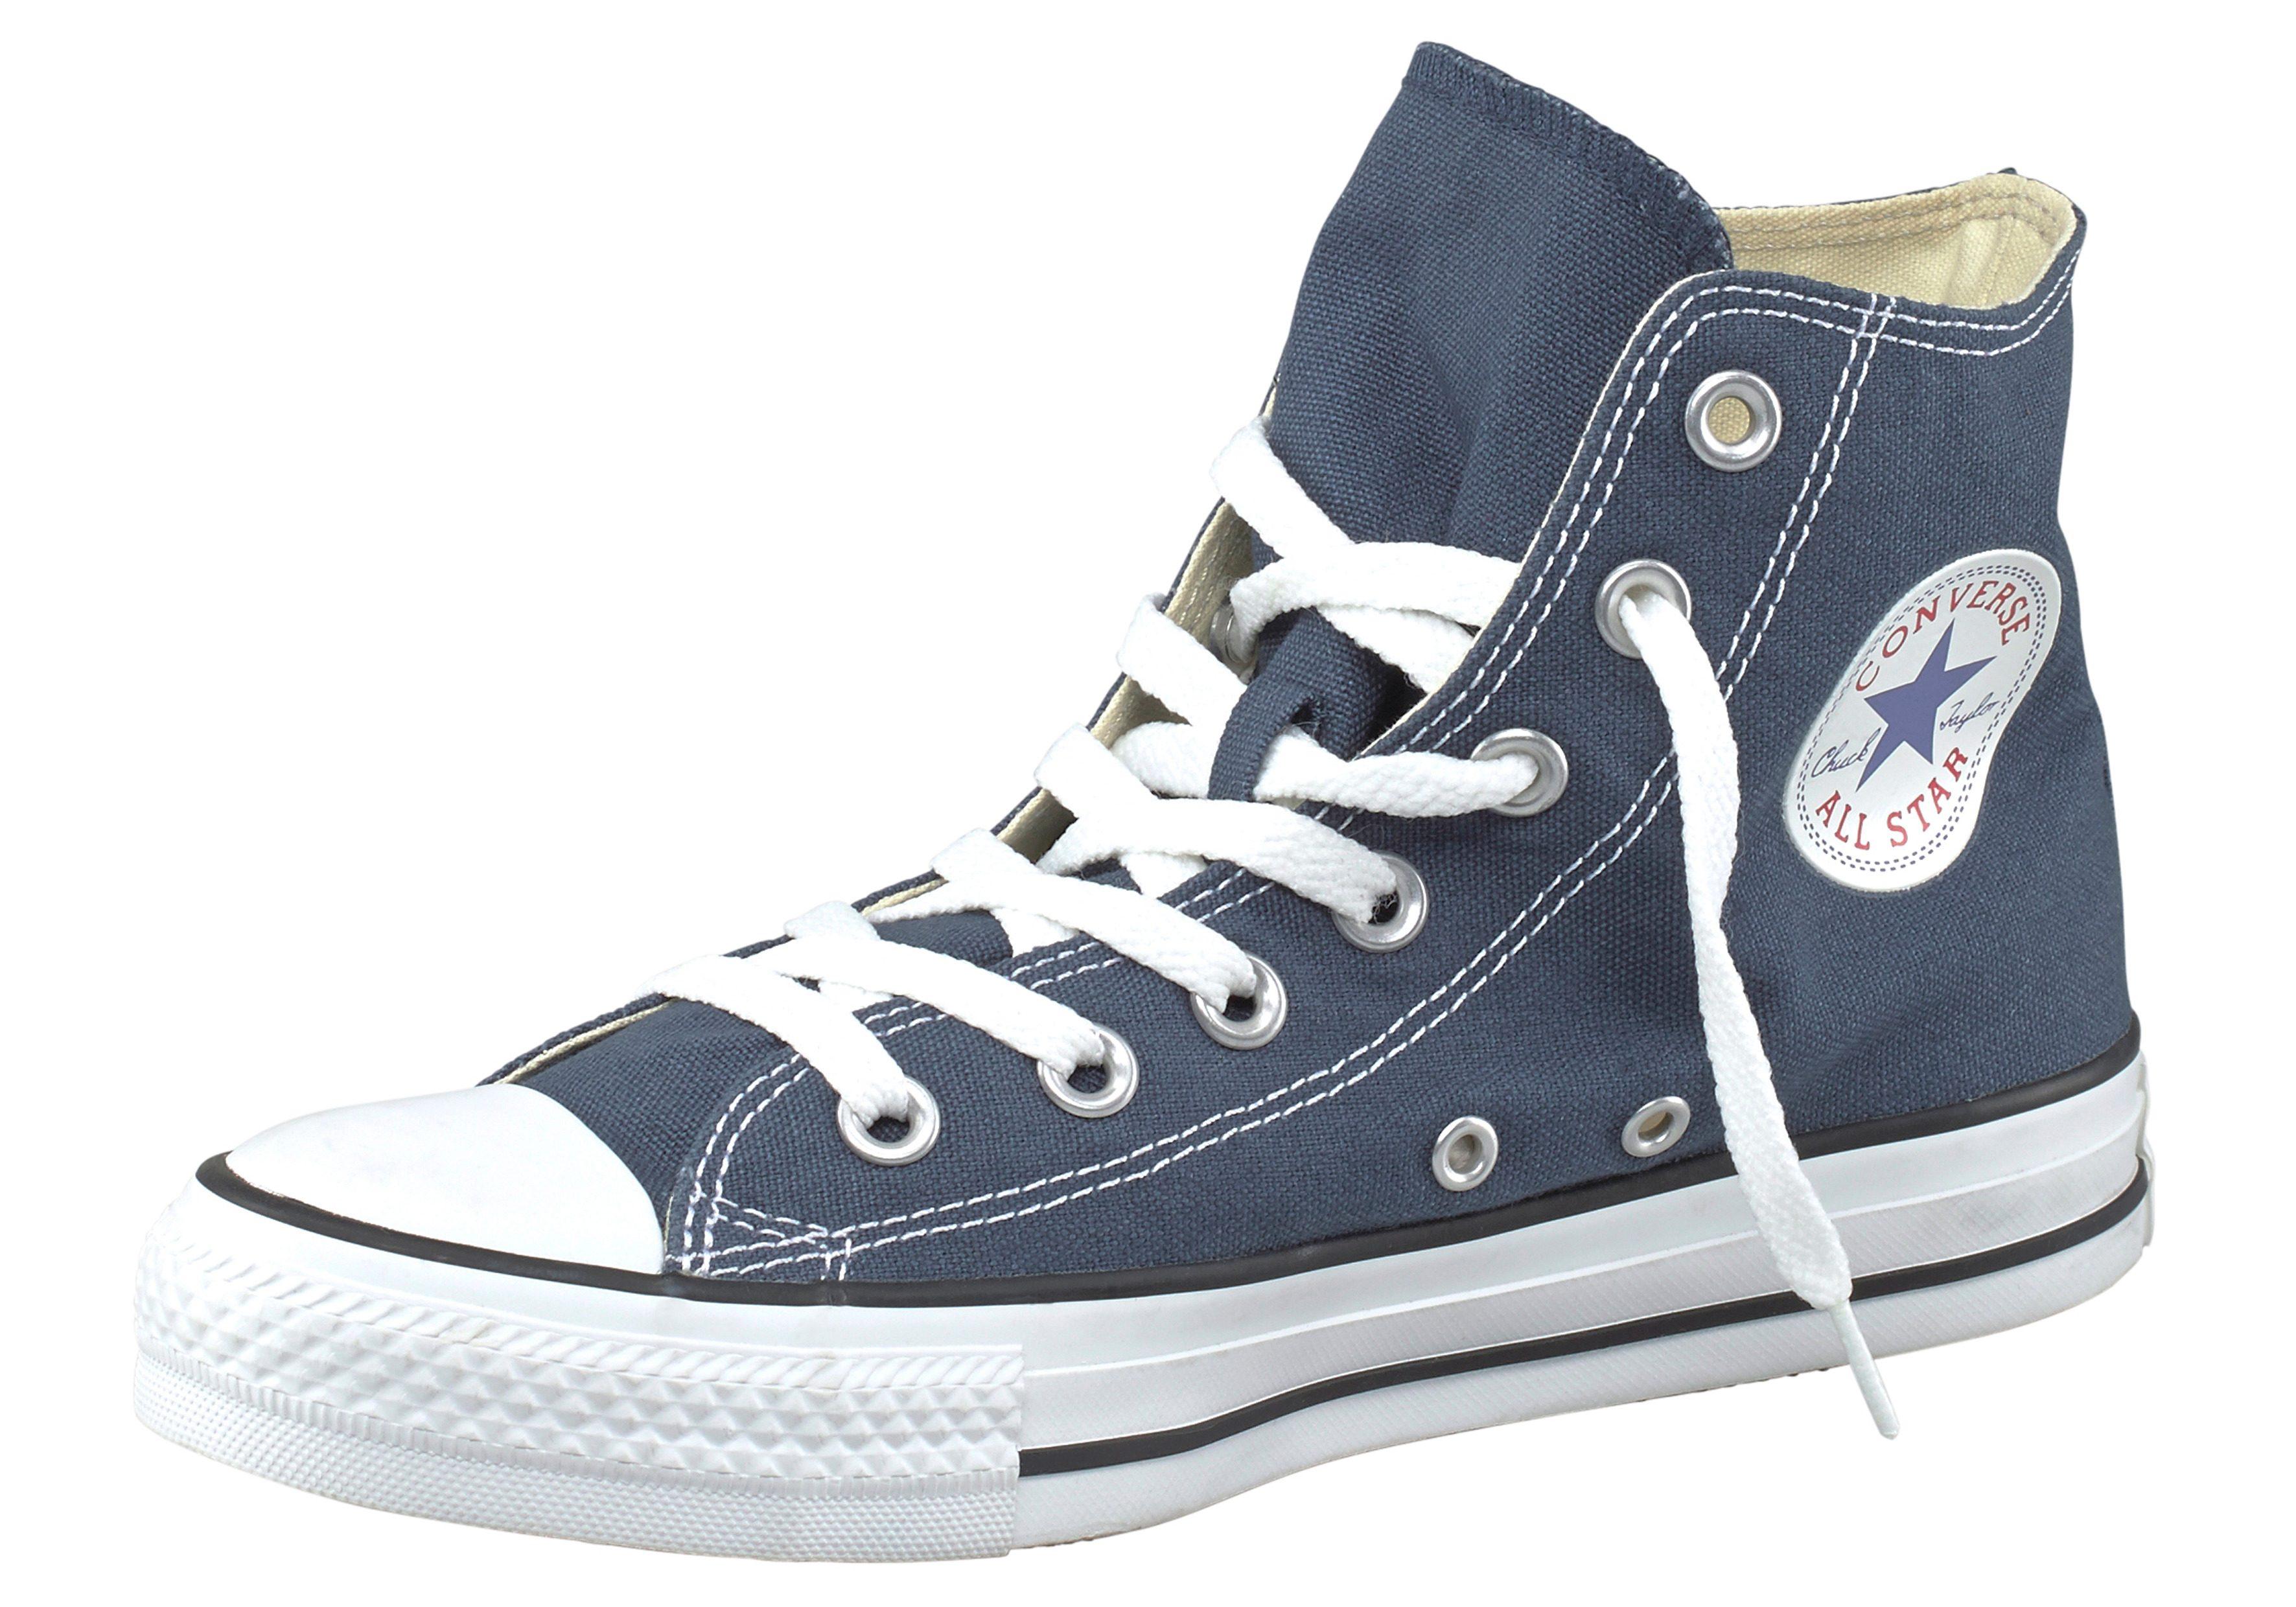 Converse Chuck Taylor All Star Core High Sneaker rTVLnLf